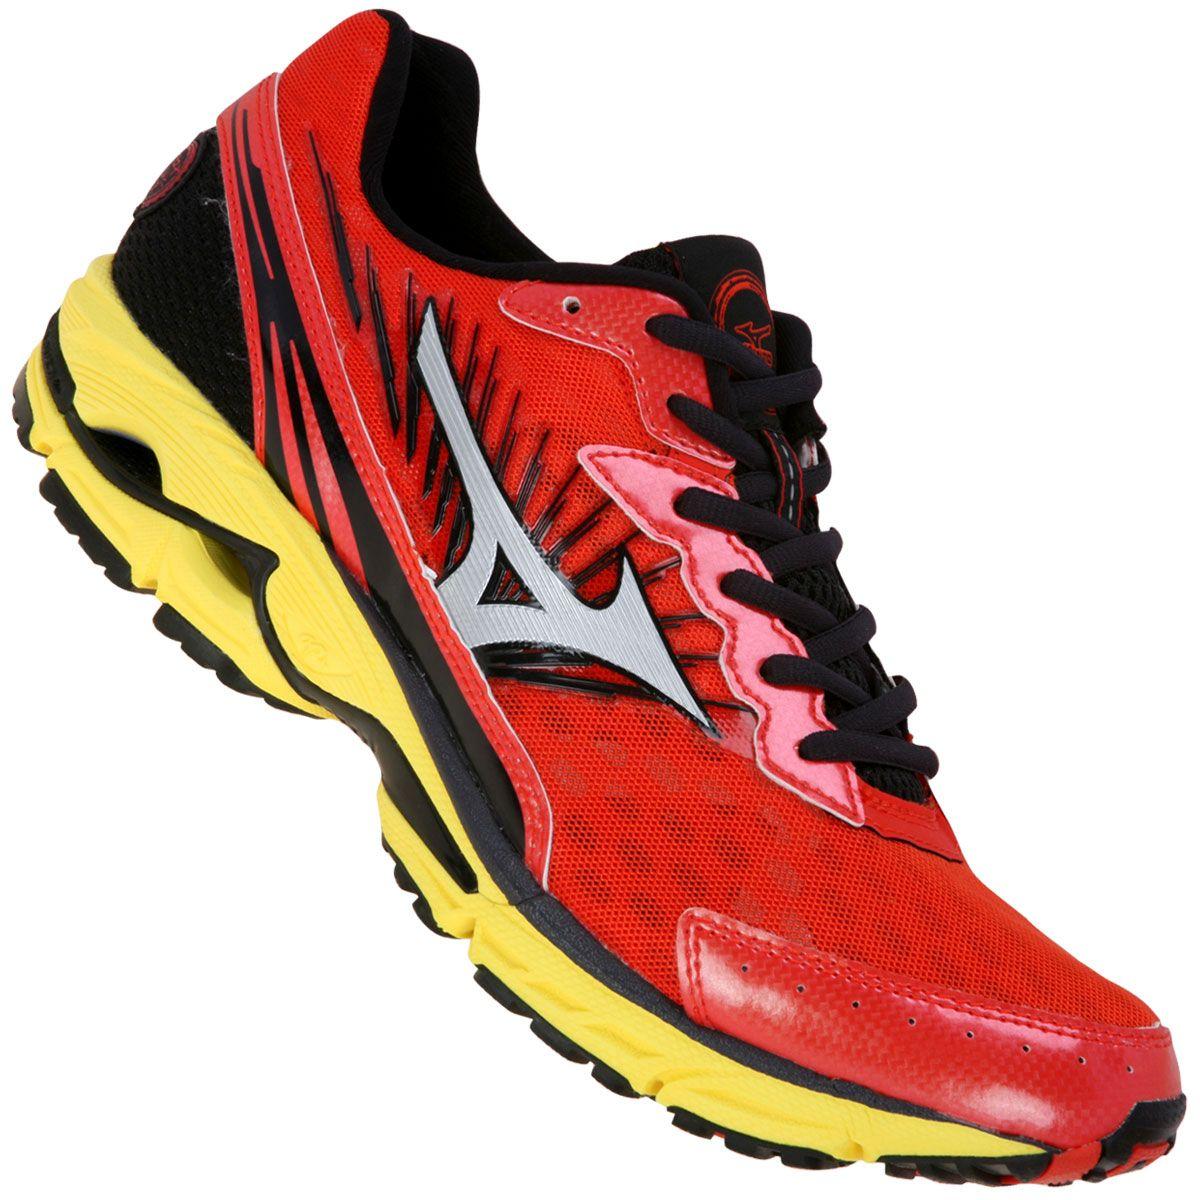 2bdff11783 Compre já o seu Tênis Mizuno Wave Prorunner 16 – Masculino